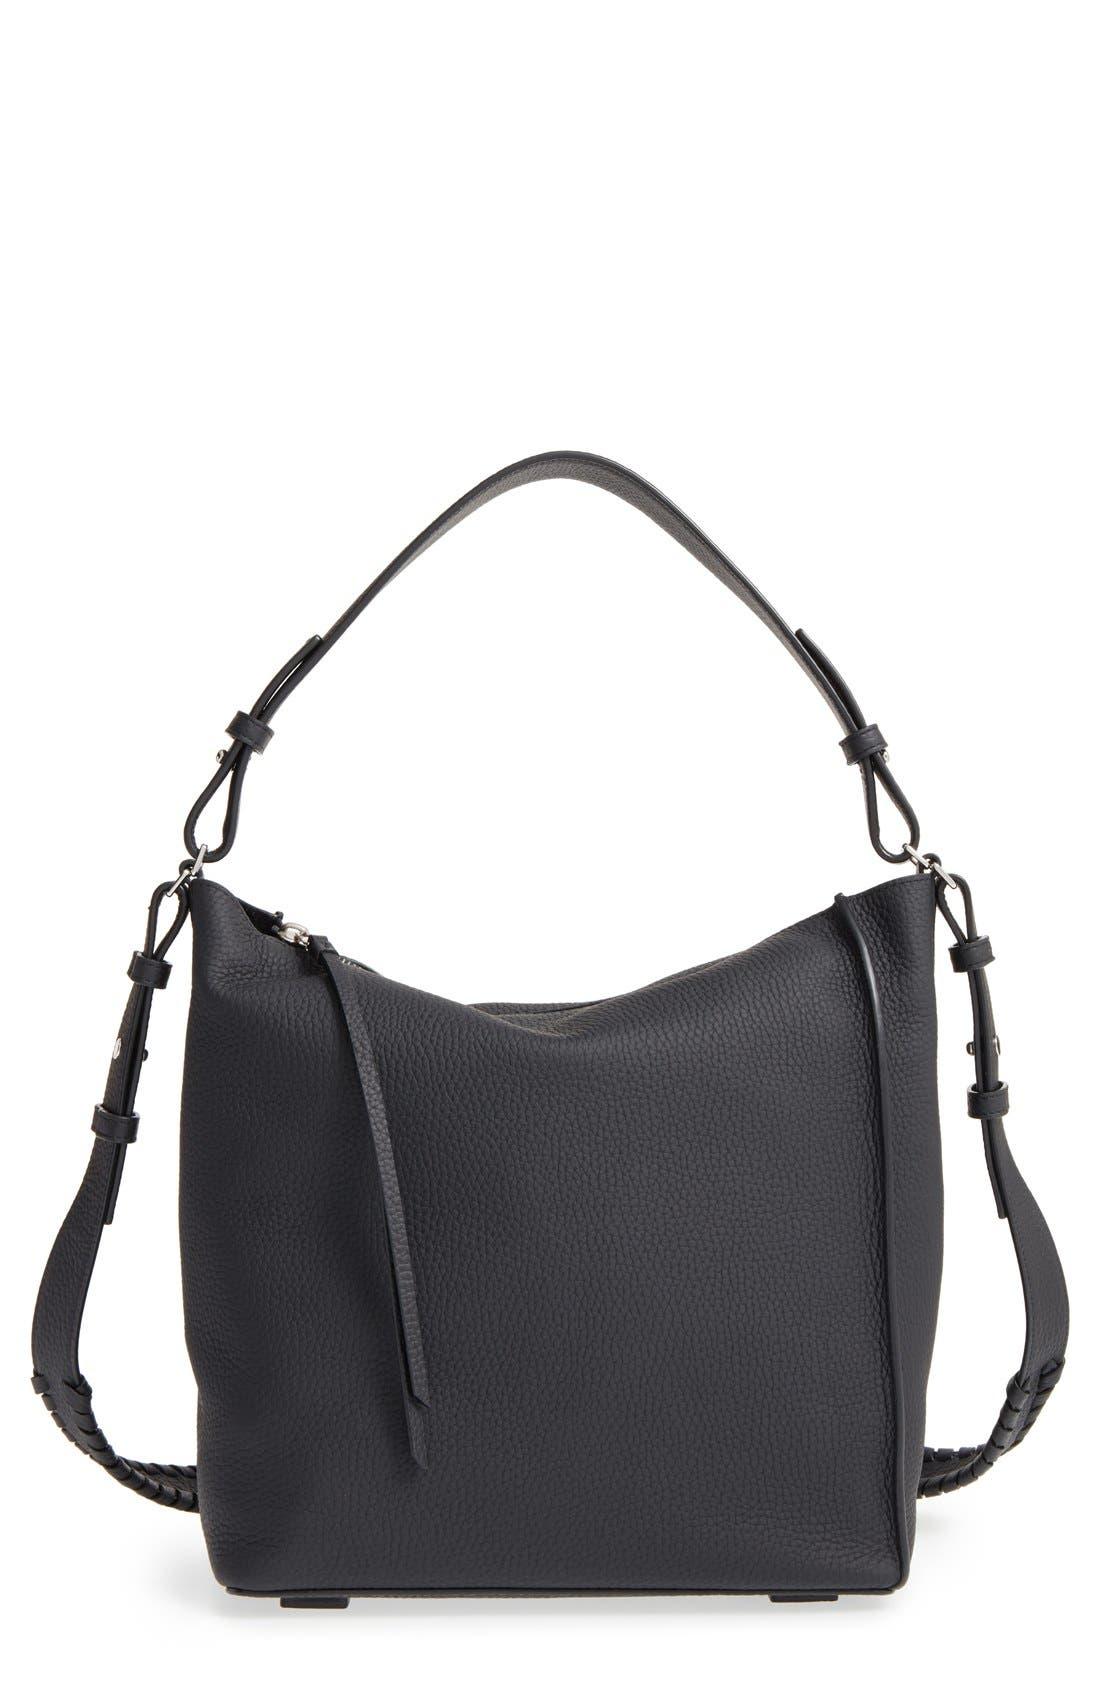 Kita Leather Shoulder/crossbody Bag